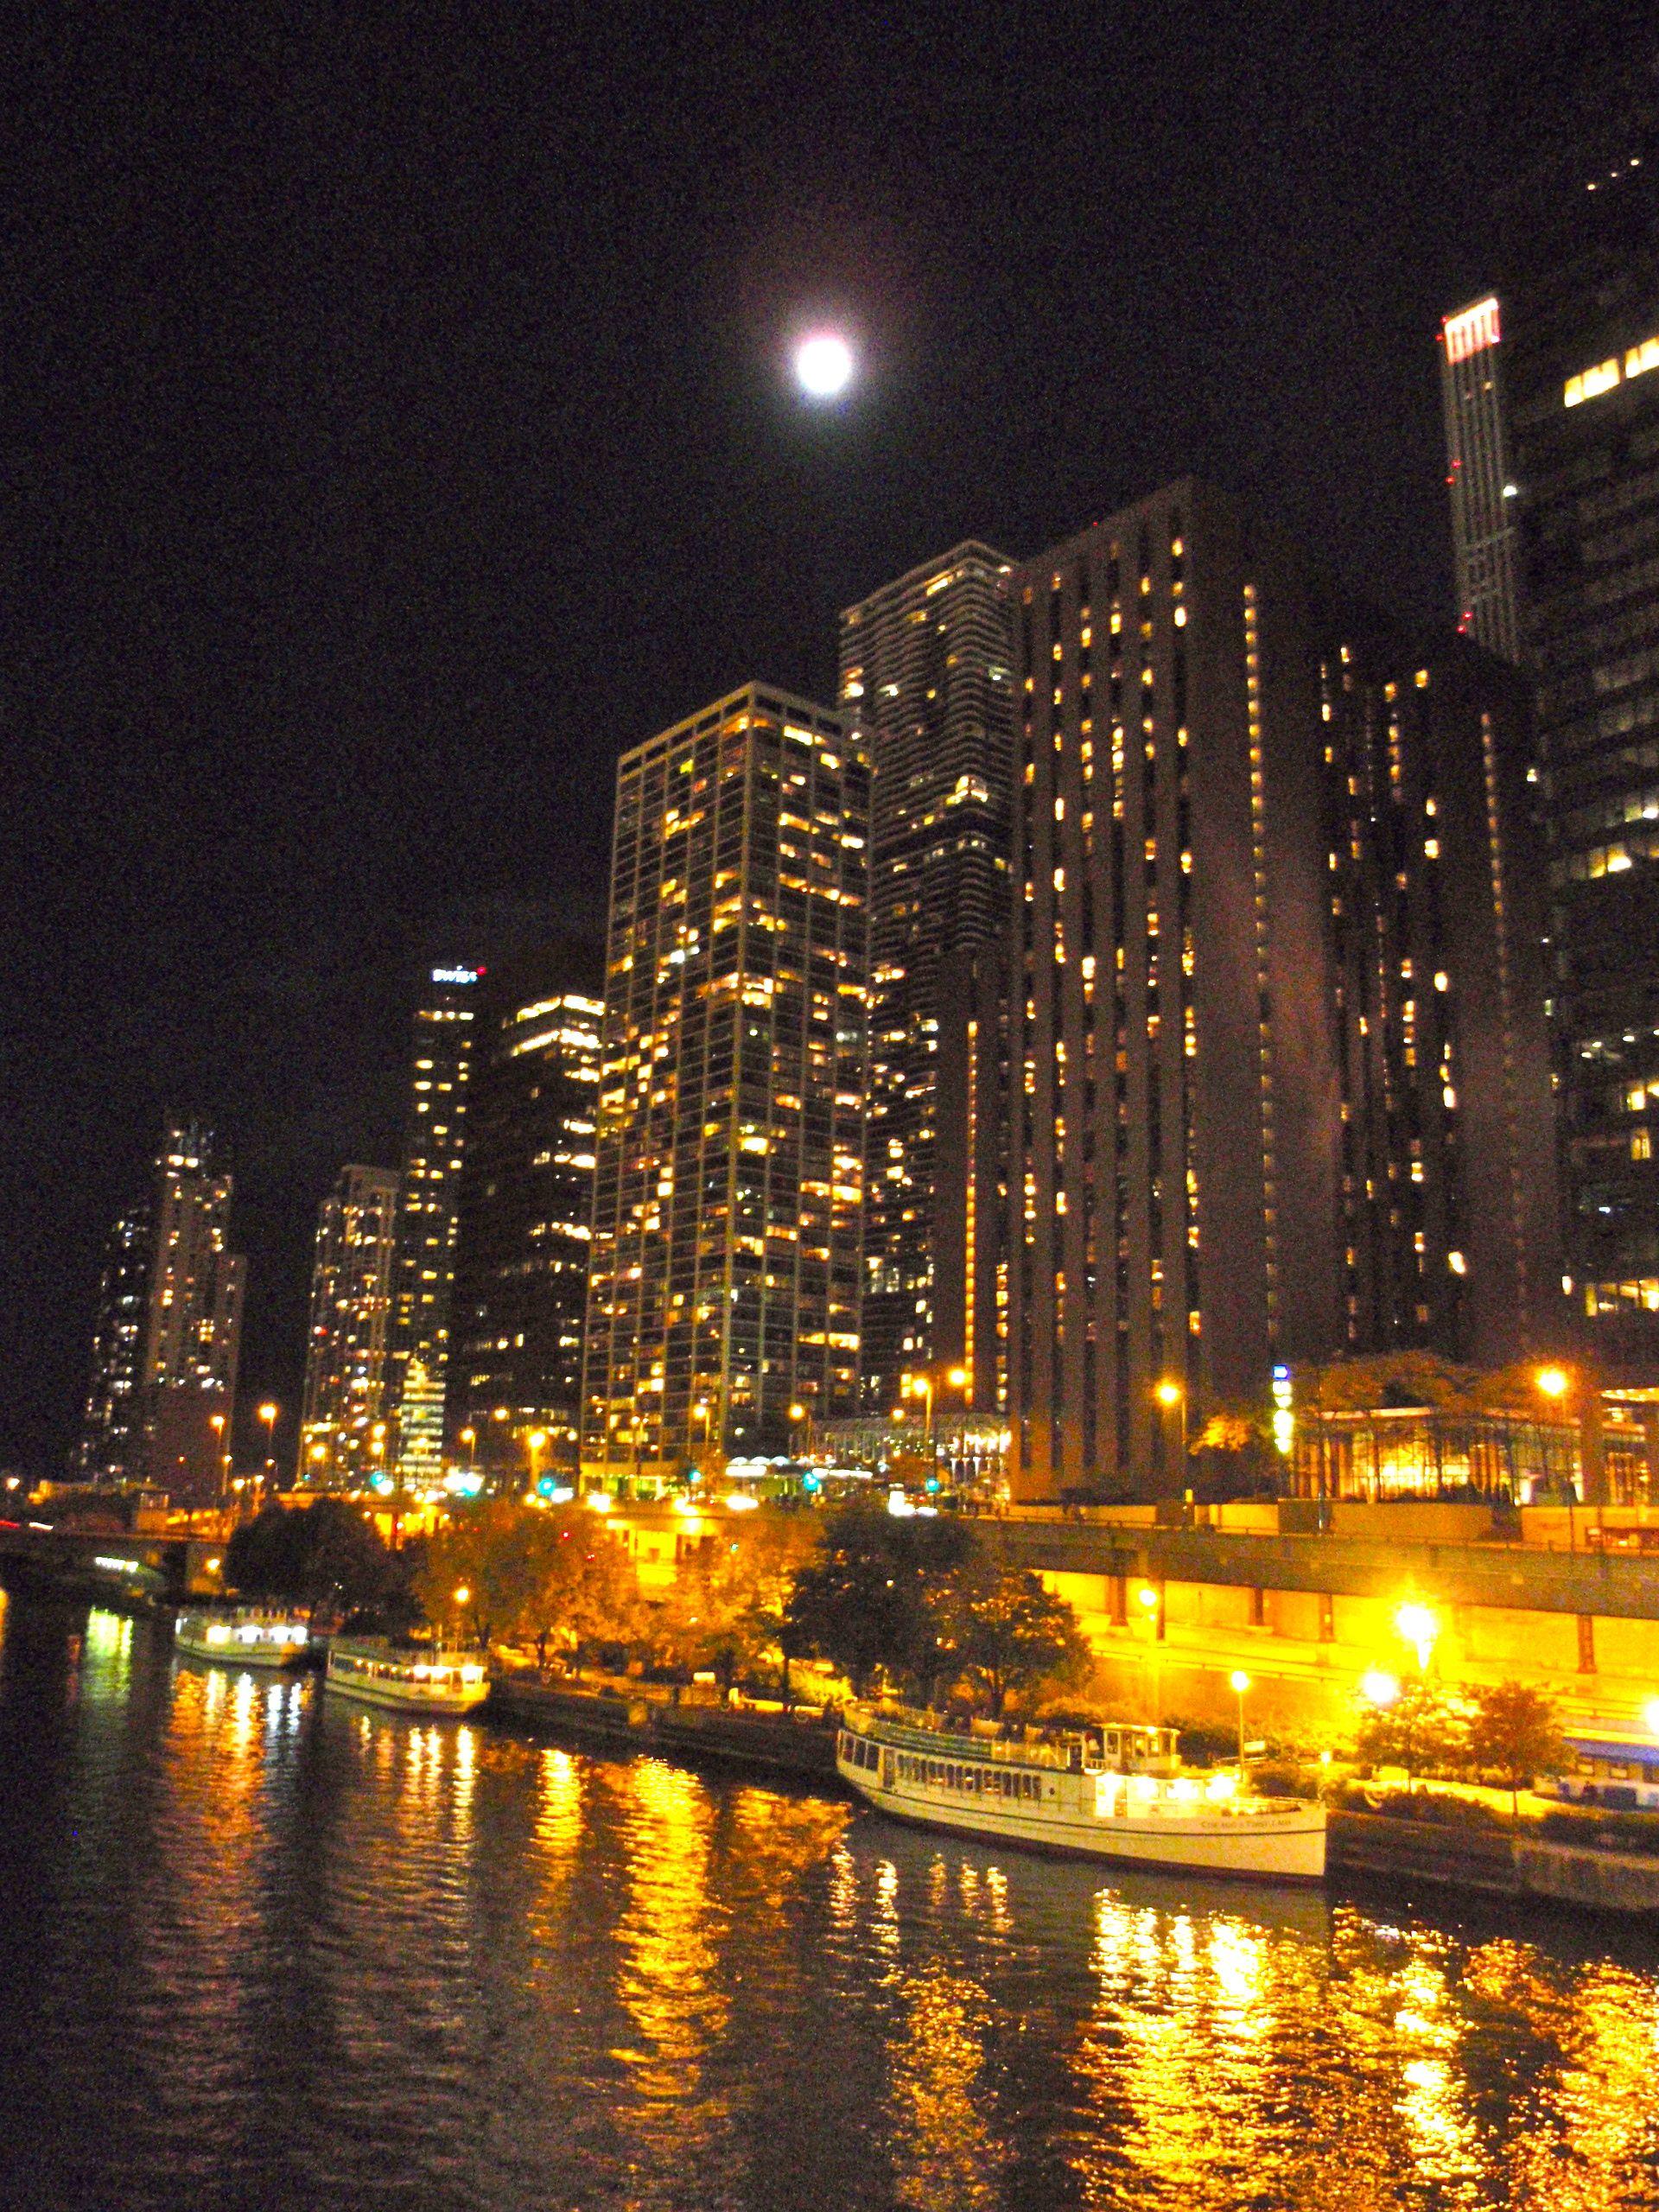 Full moon over Chicago | Random Happy Things | Pinterest | Chicago ...